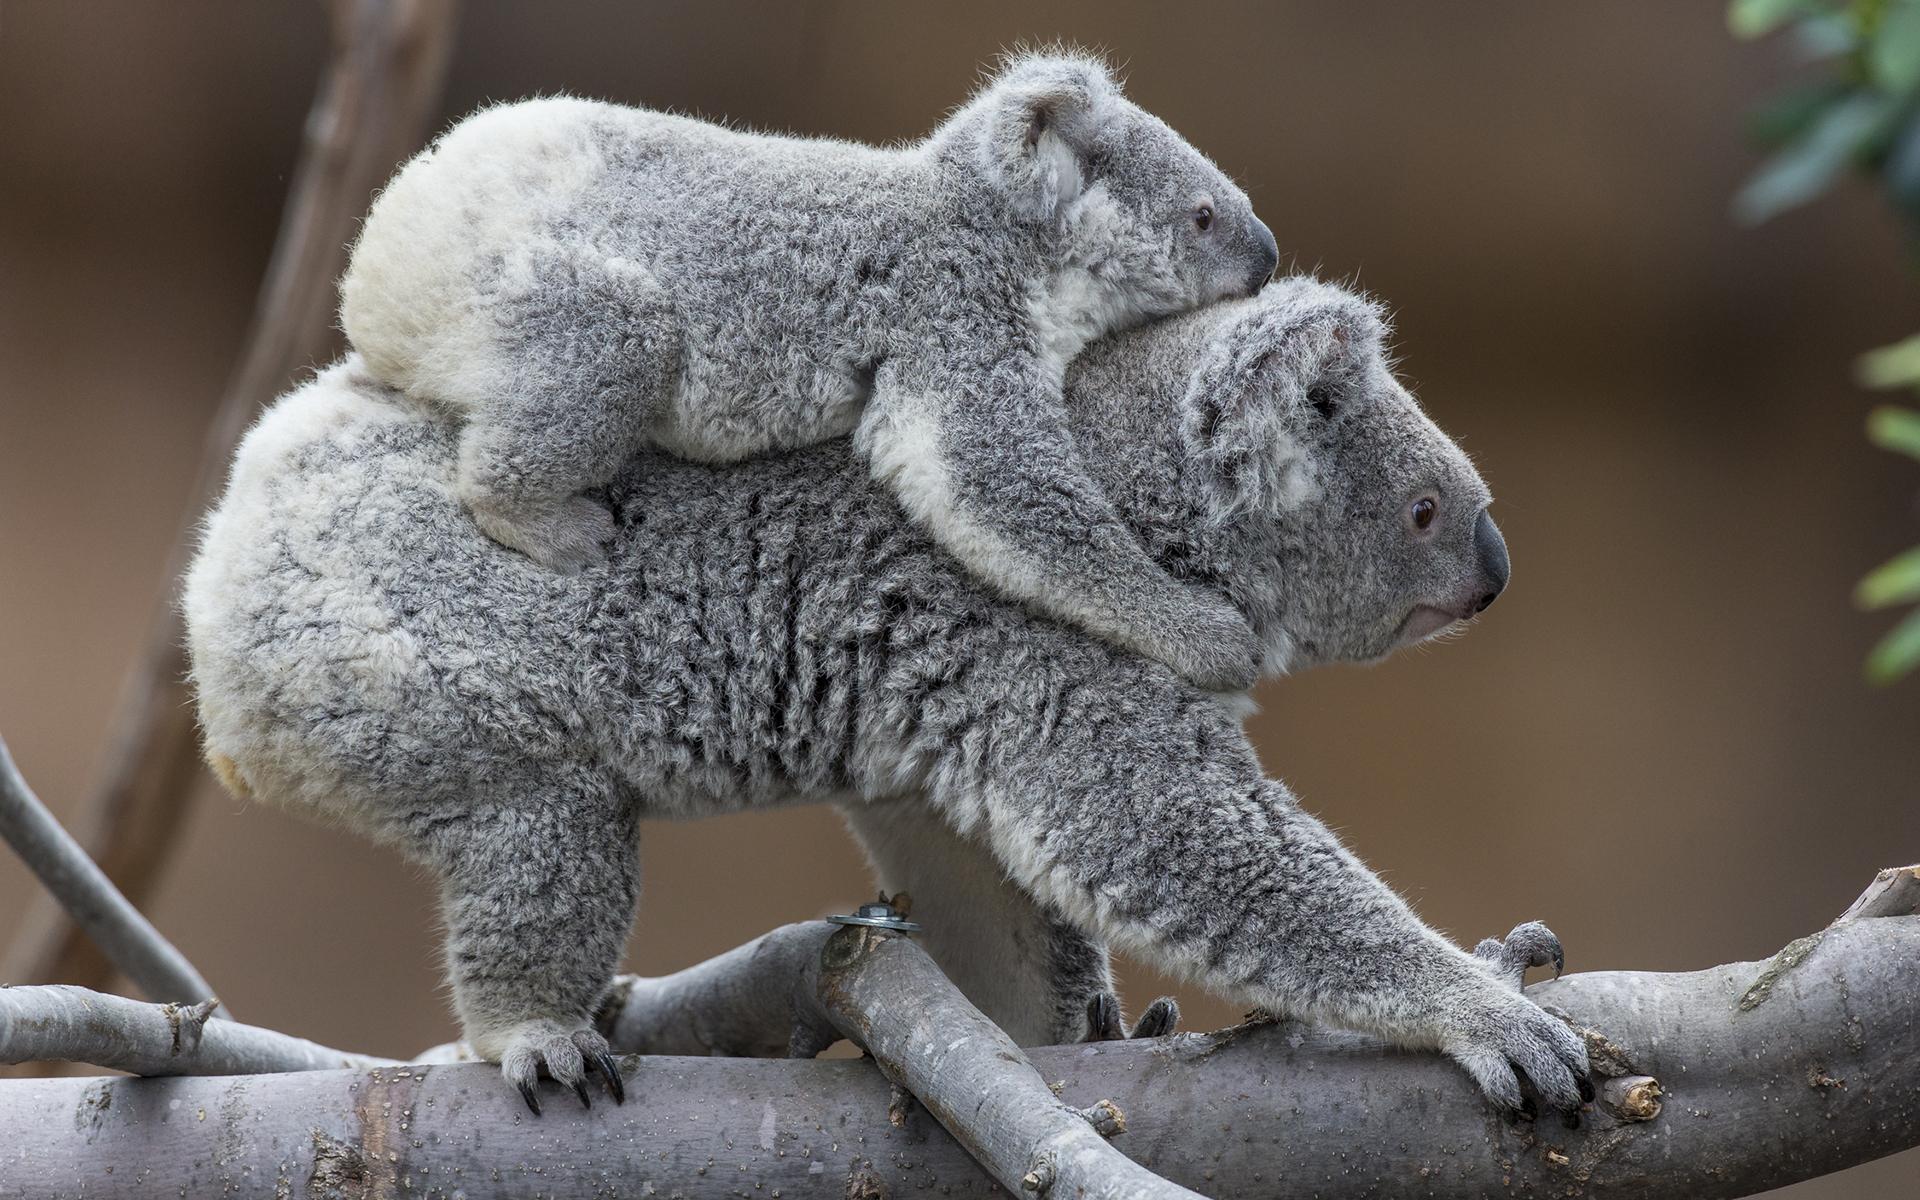 Koala baby h wallpaper 1920x1200 195978 WallpaperUP 1920x1200